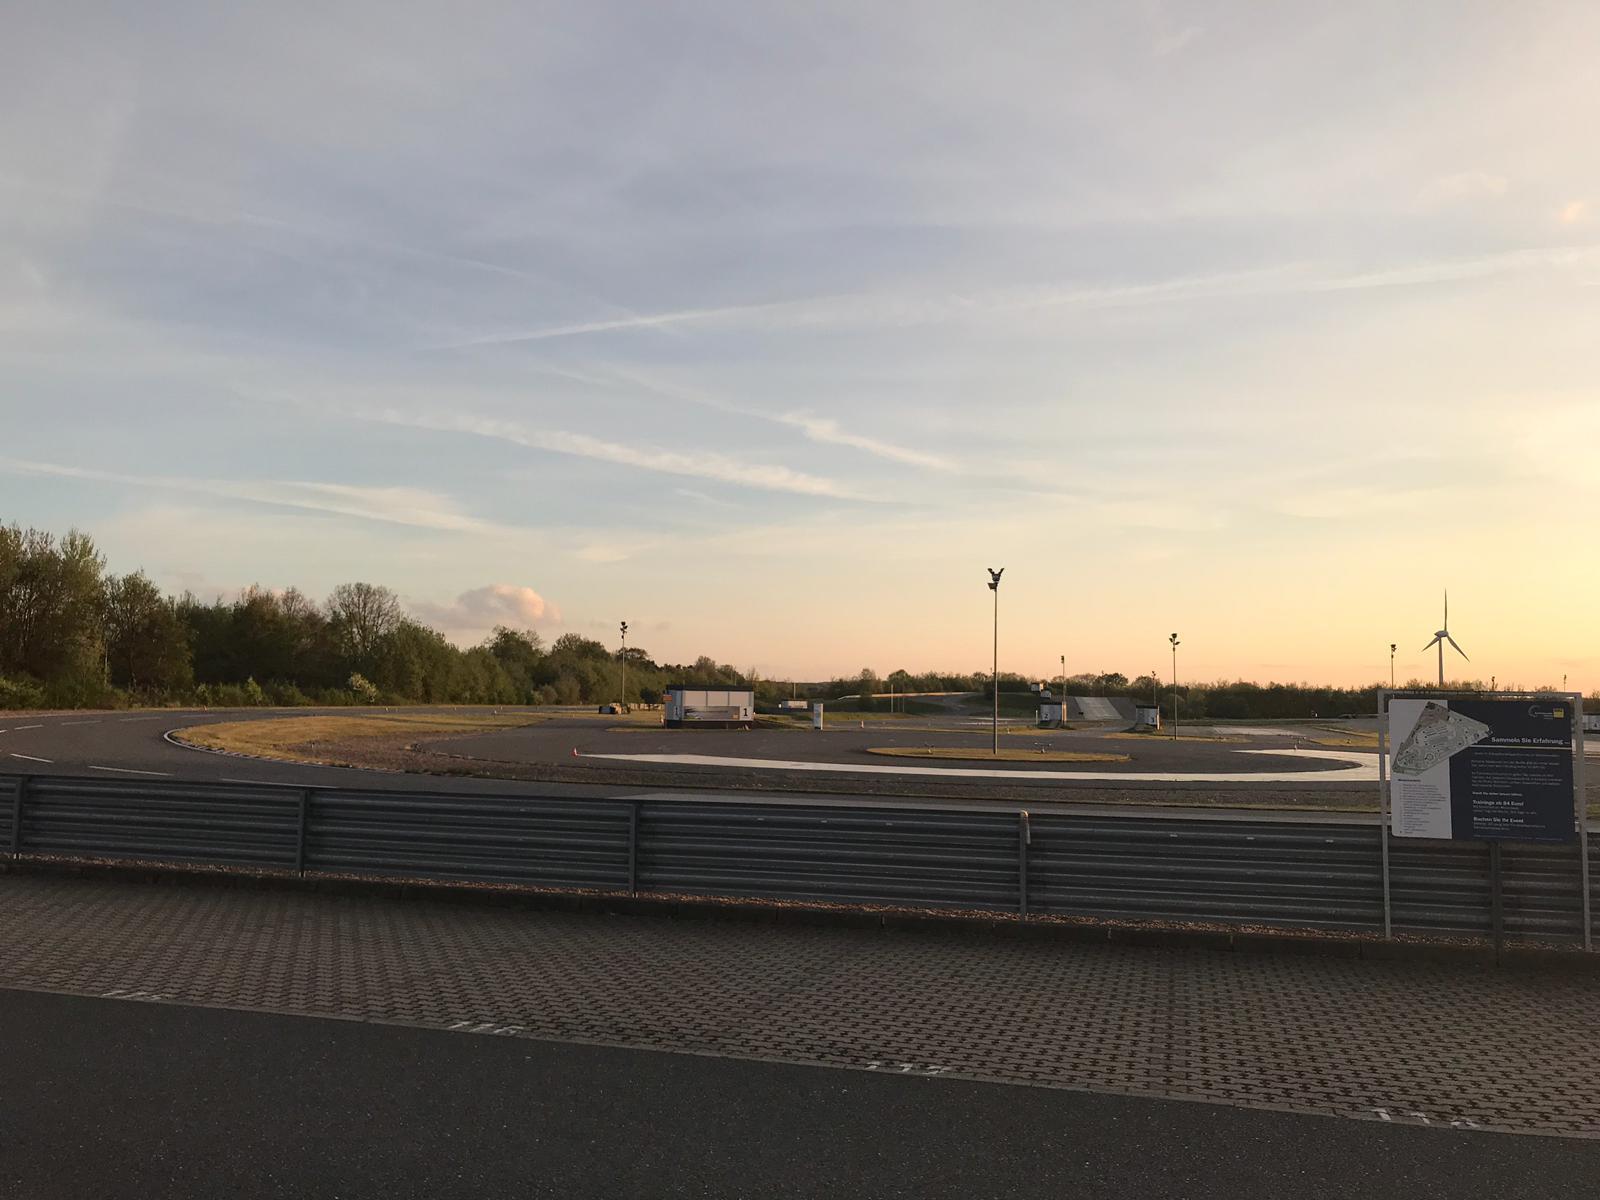 Motorrad Intensivtraining mit dem ADAC in Lüneburg